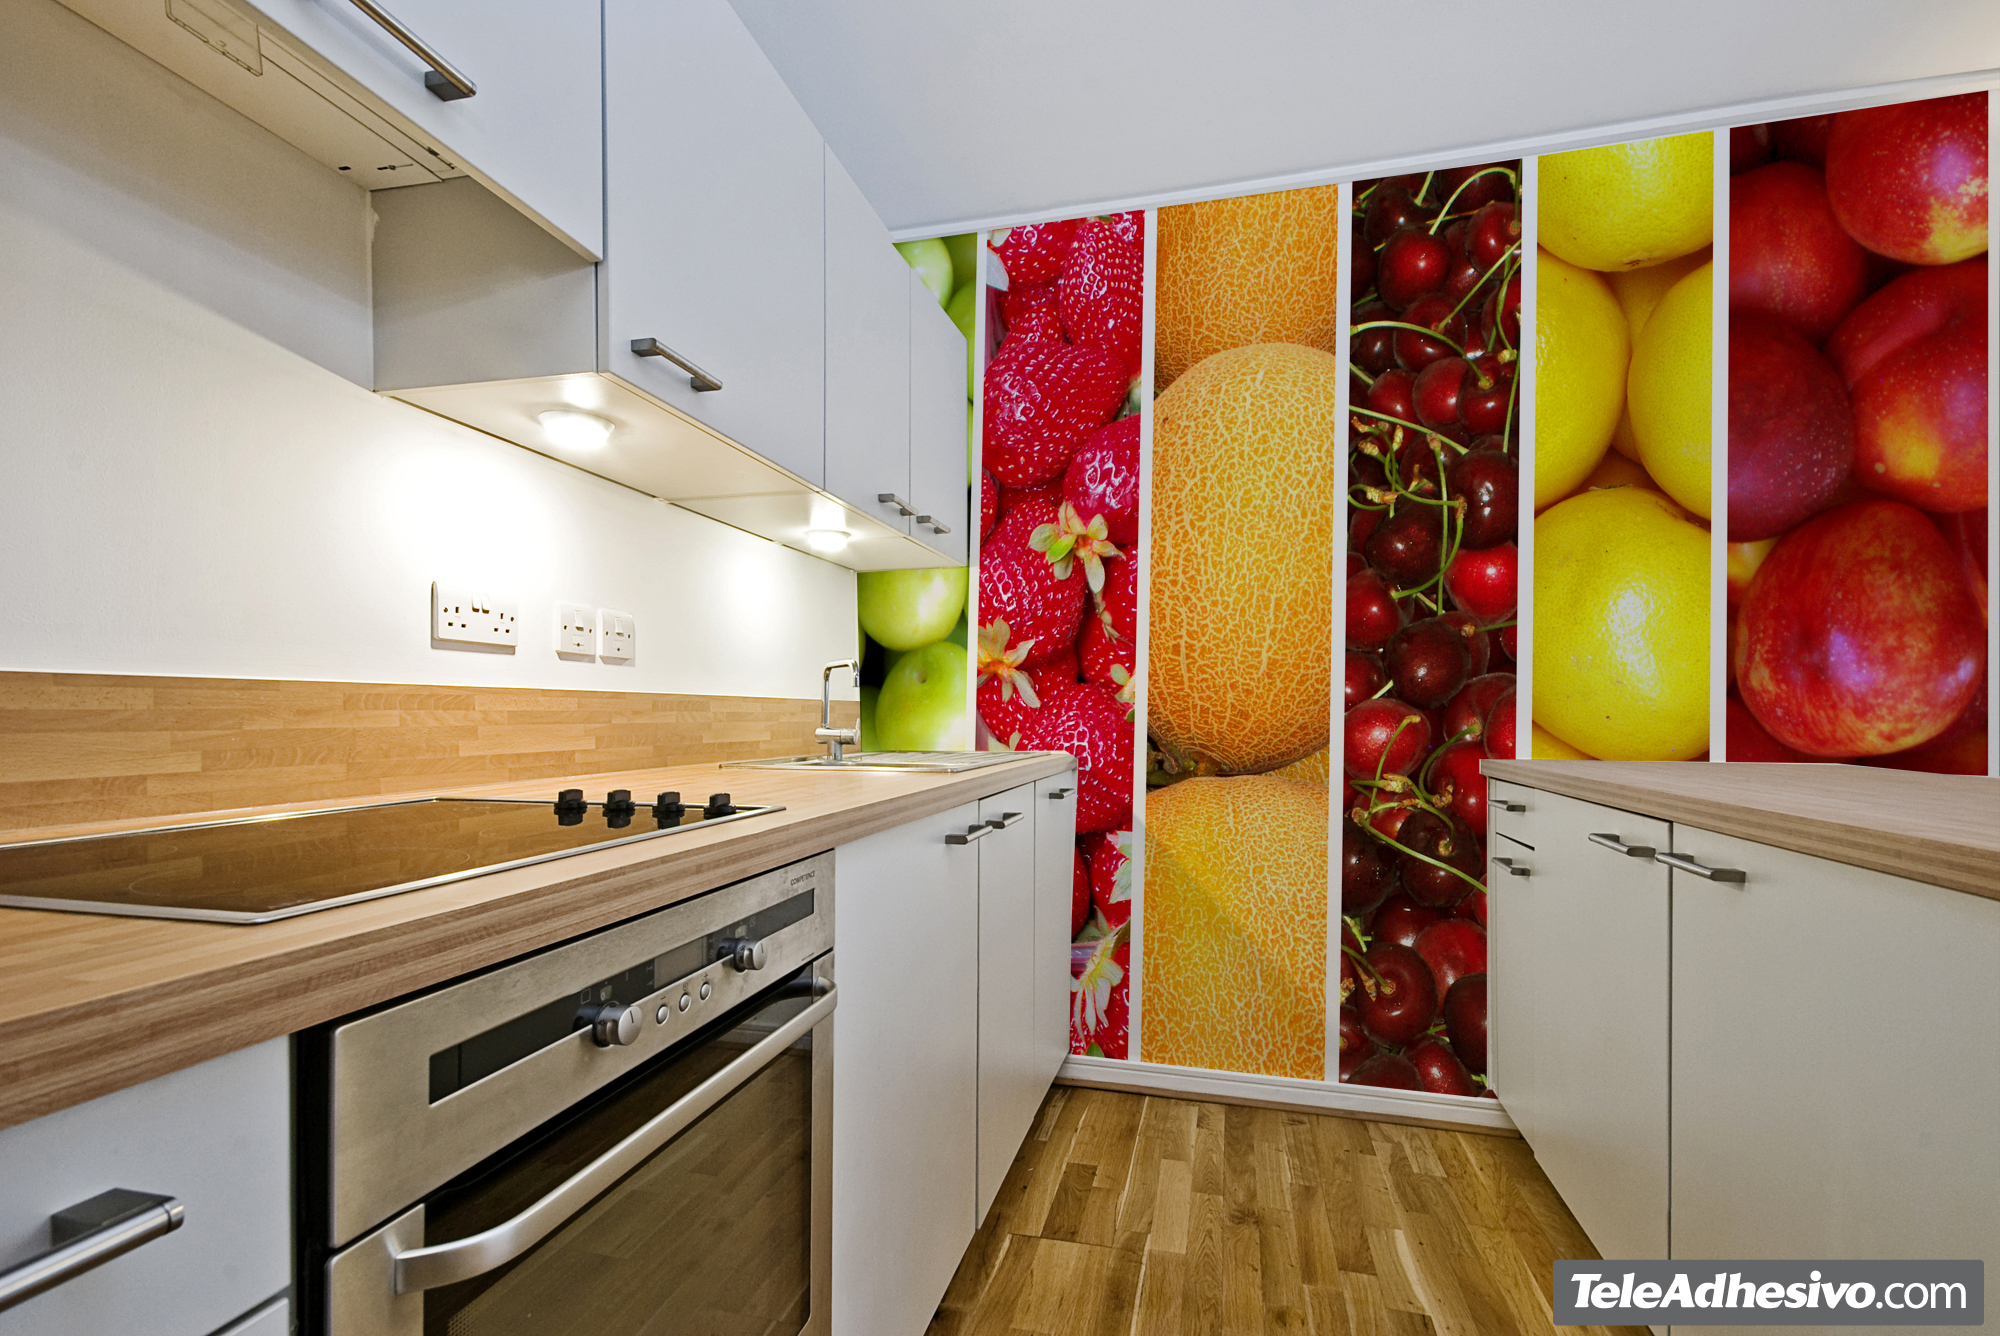 Fruta fresca en tu bar o tienda - Fotomural para cocina ...